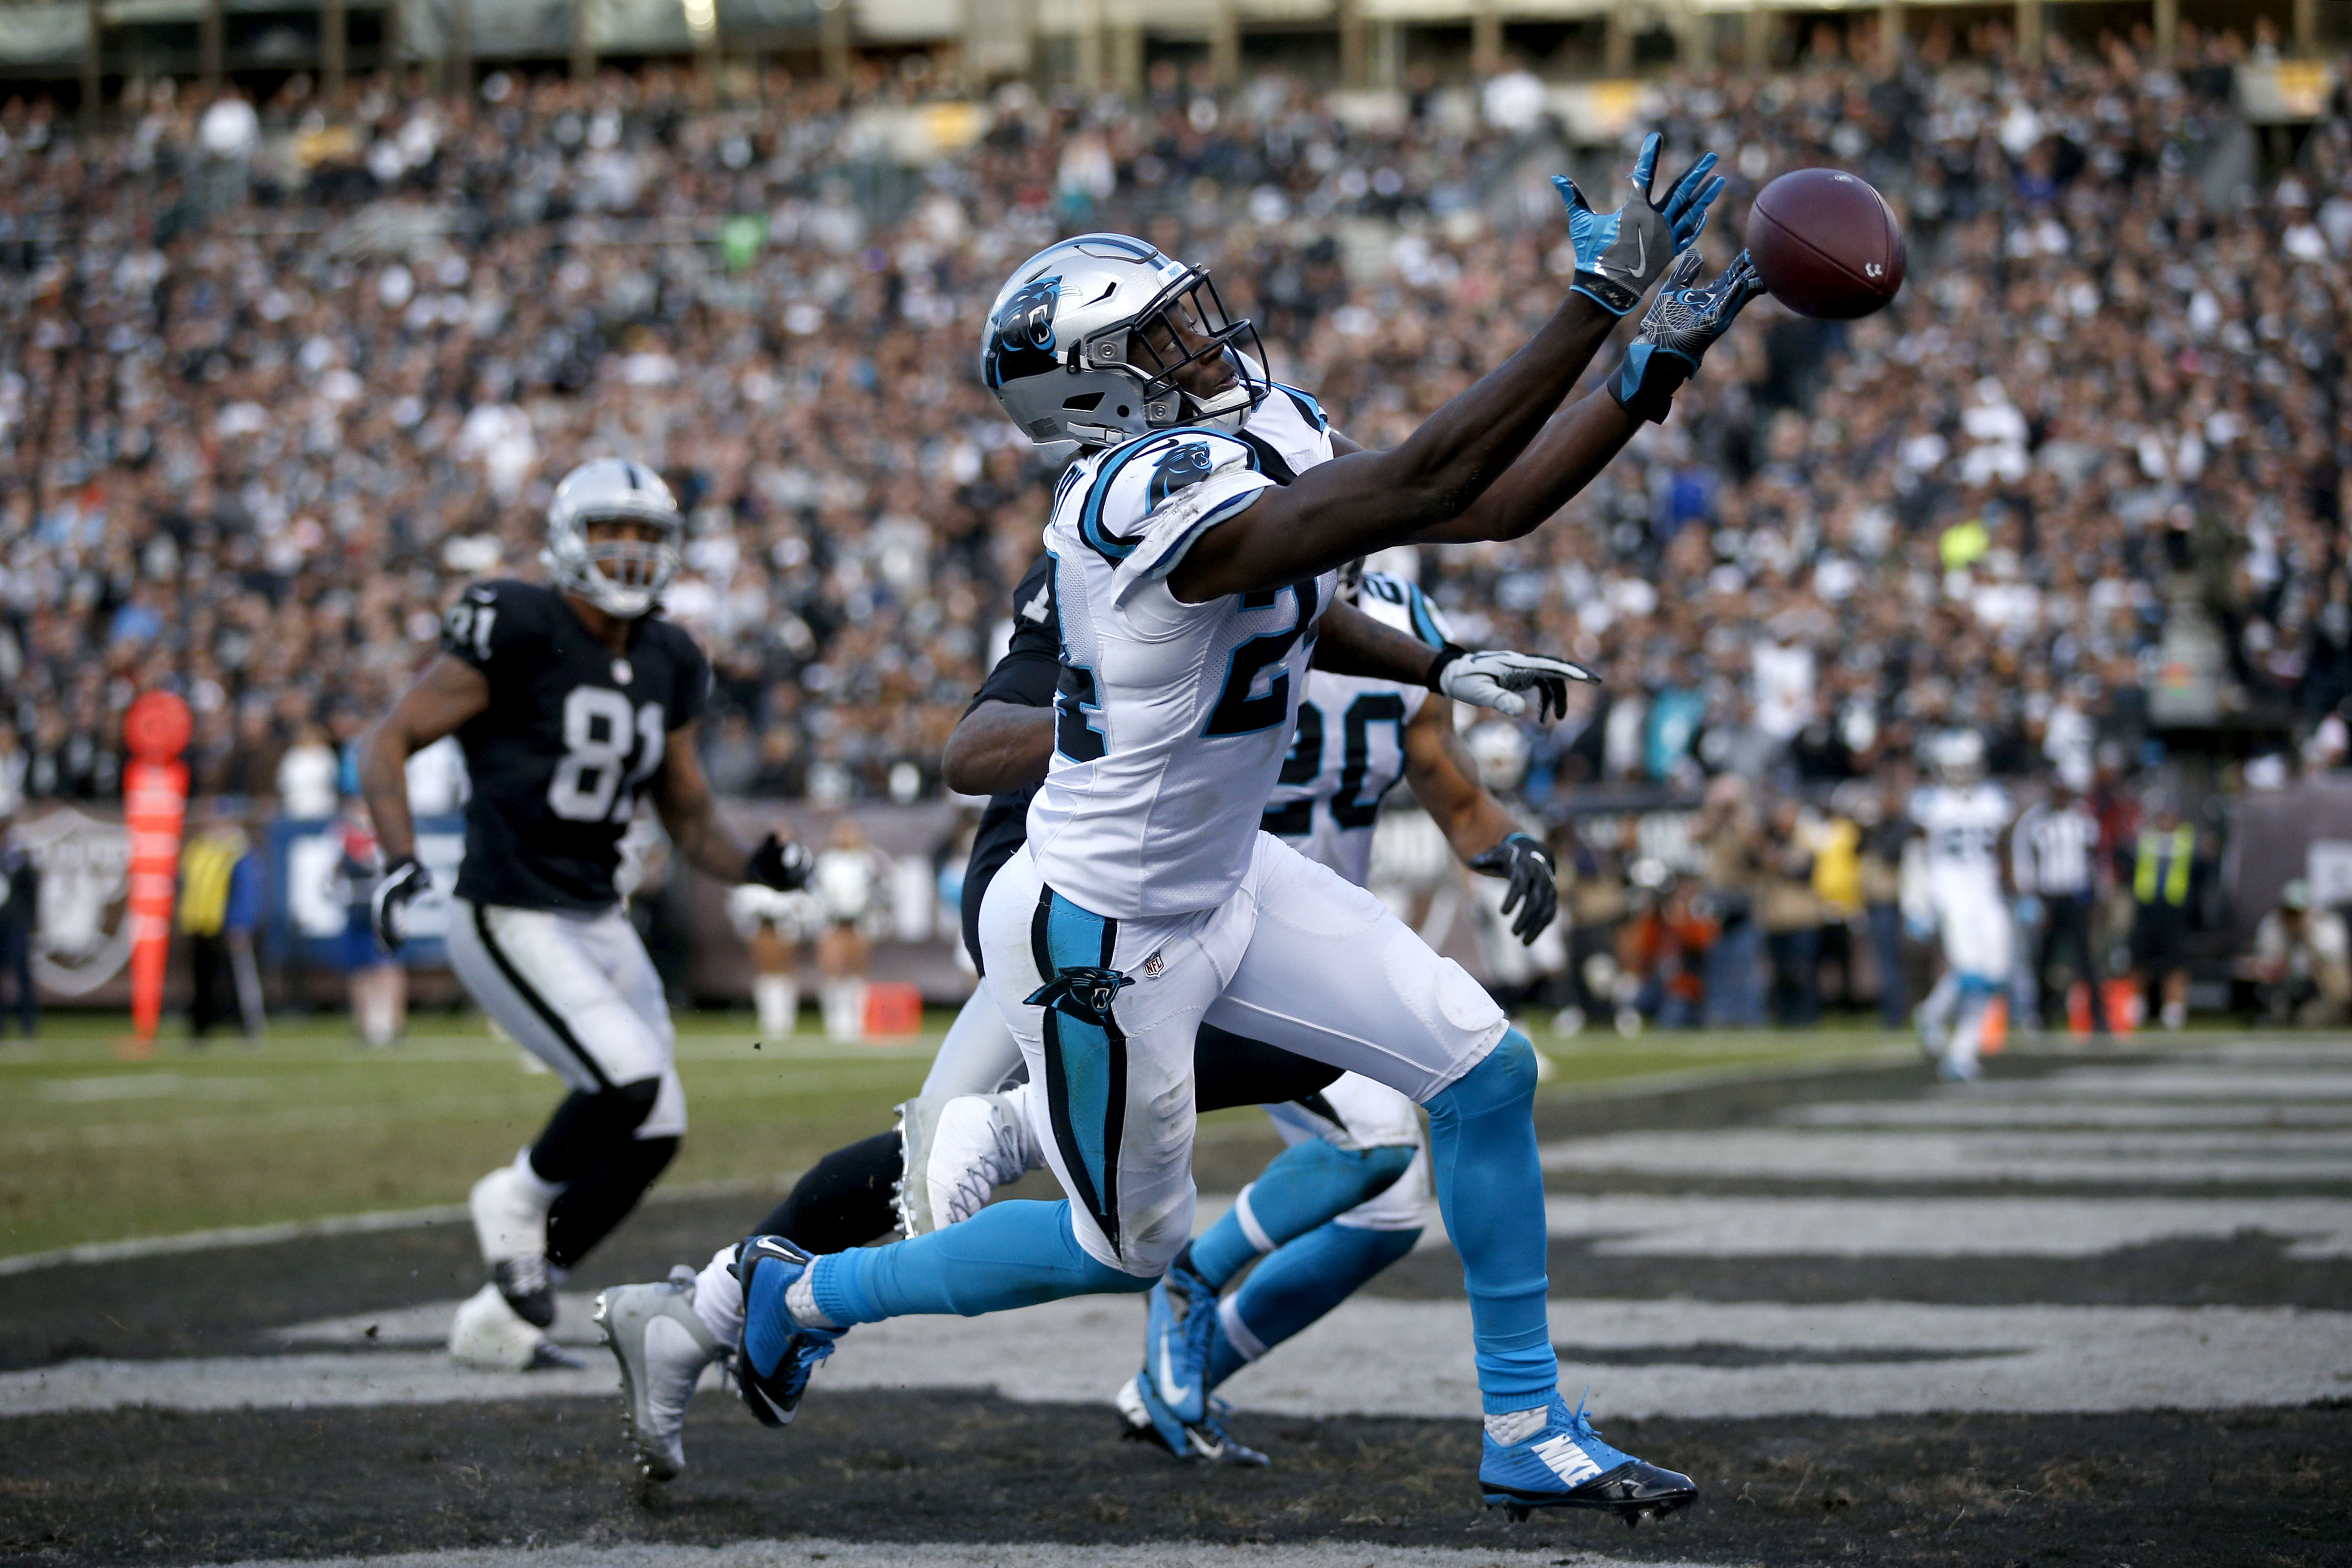 NFL: Carolina Panthers at Oakland Raiders